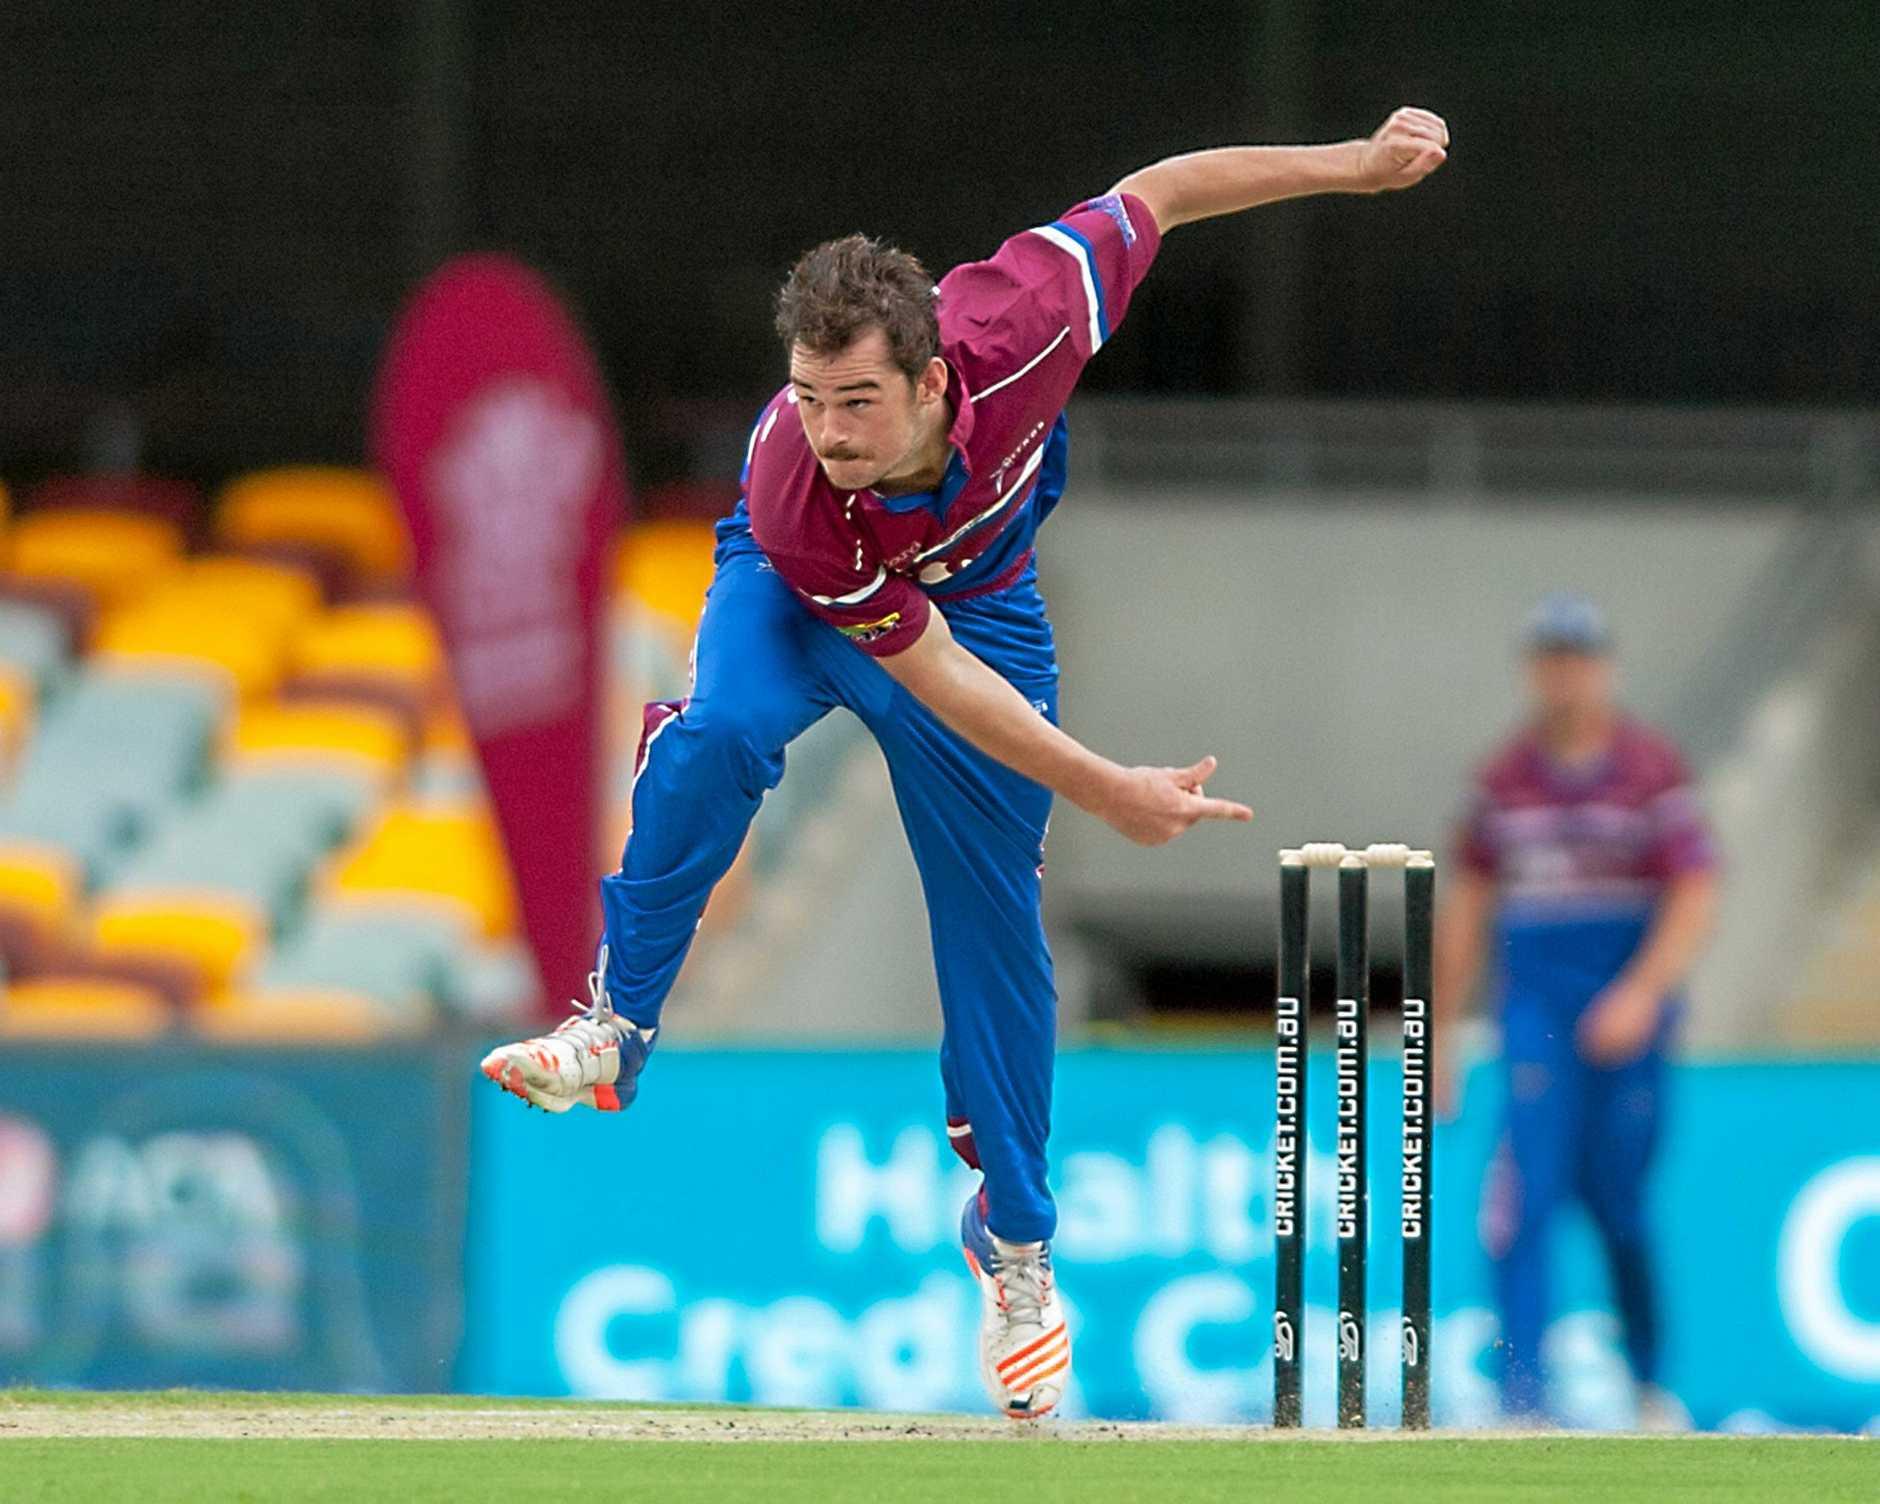 Magpies star bowler, Todd Dixon